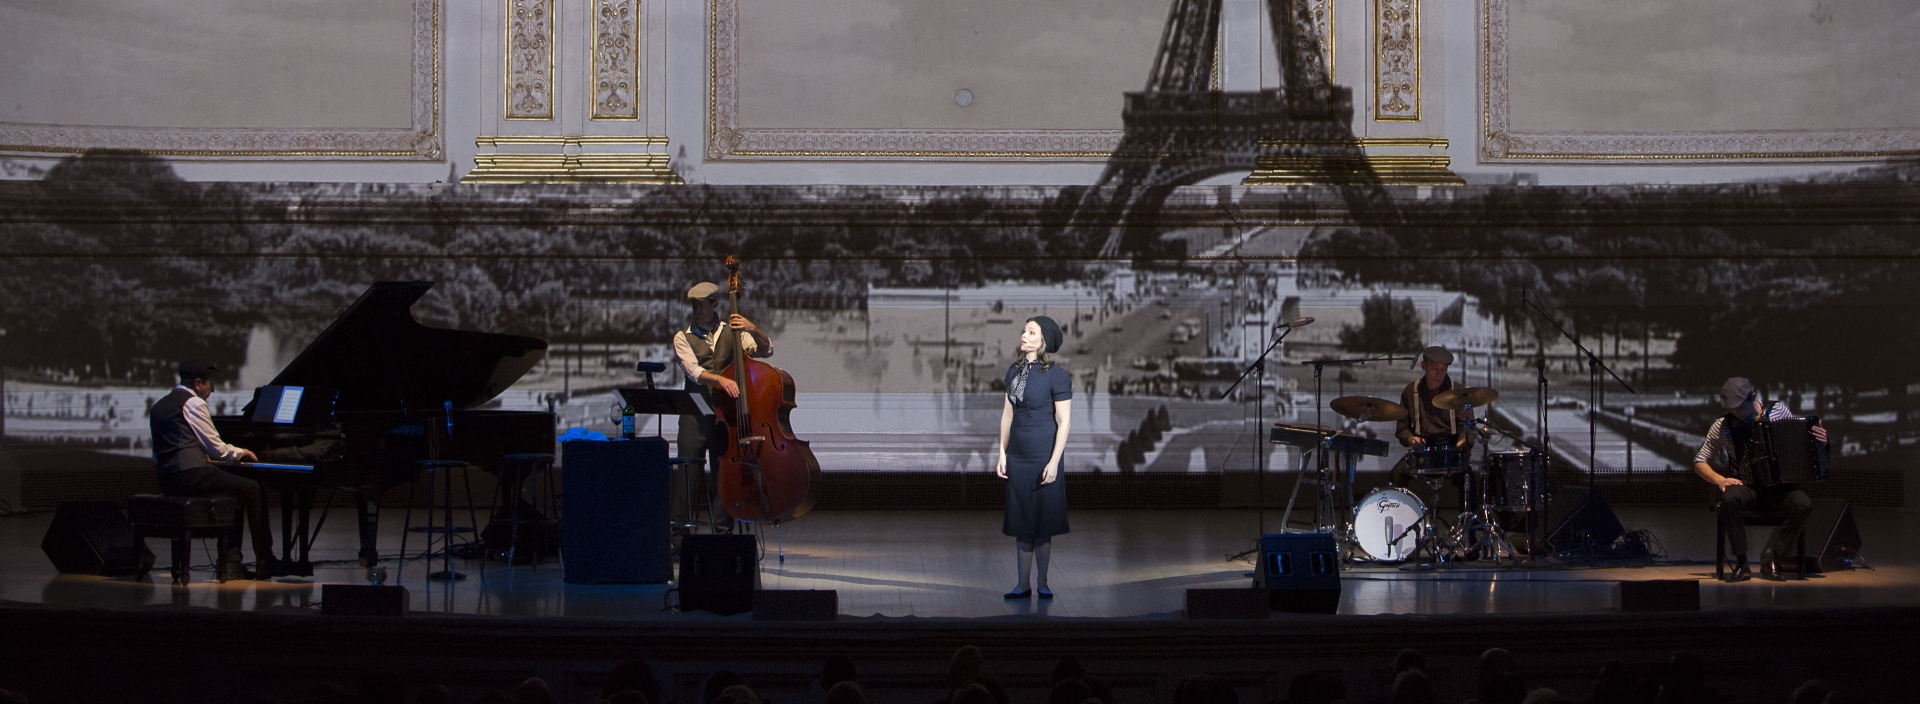 FOTO: PIAF! THE SHOW Glazbeno slavlje legendarne francuske pjevačice